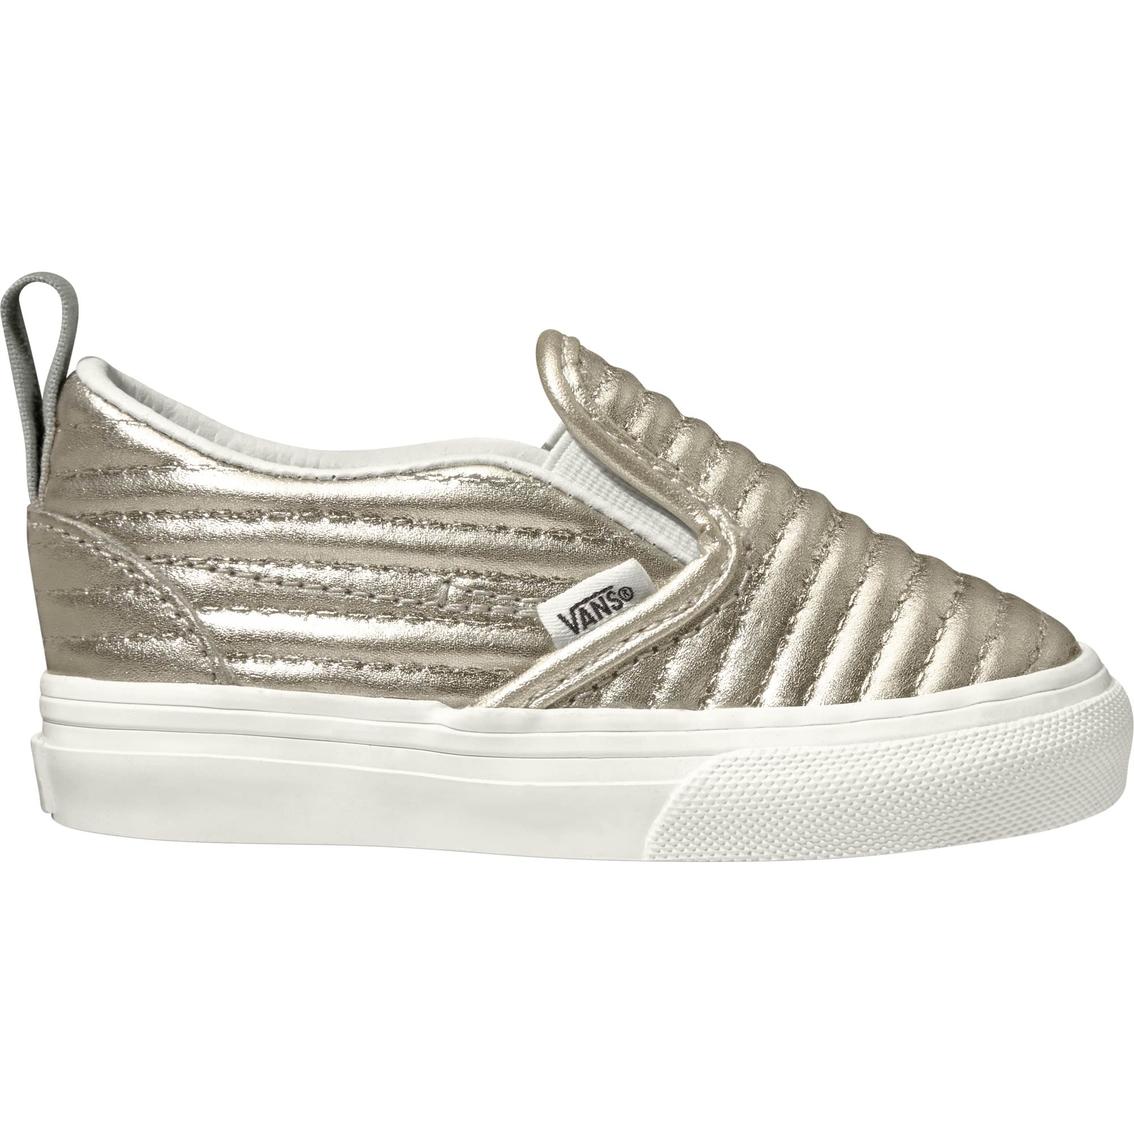 409bf10055 Vans Girls Metallic Leather Slip On